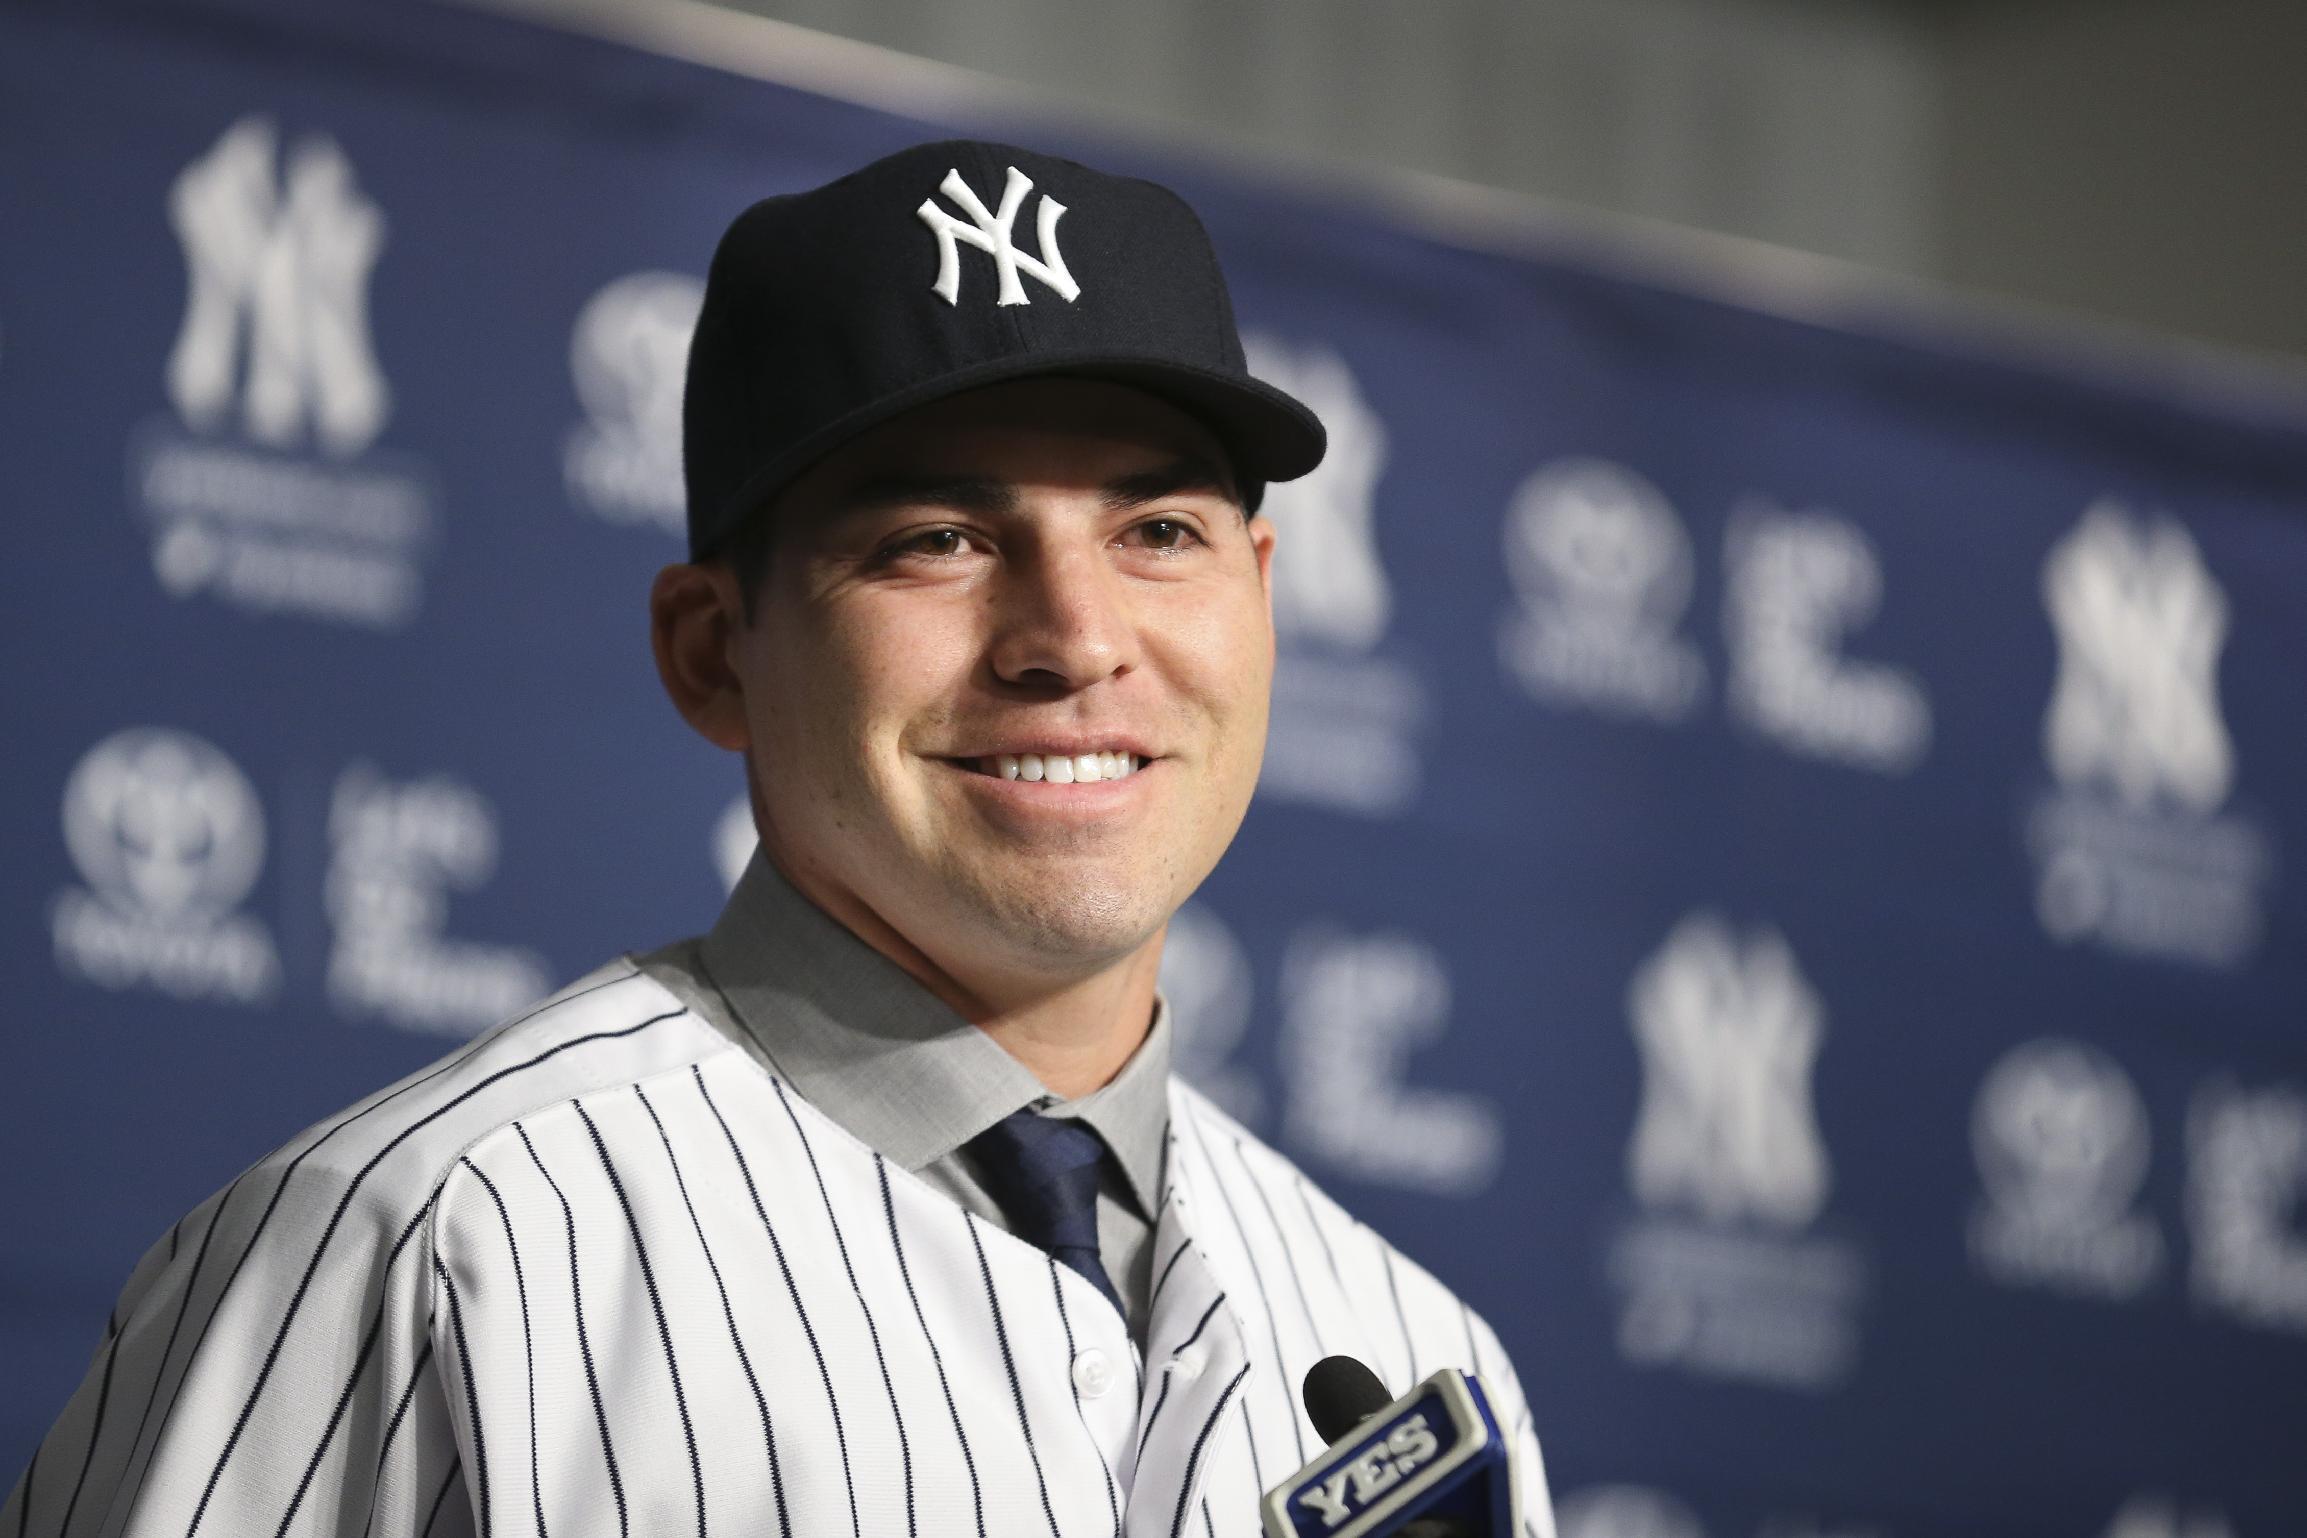 MLB average salary up 5.4 percent to $3.39 million